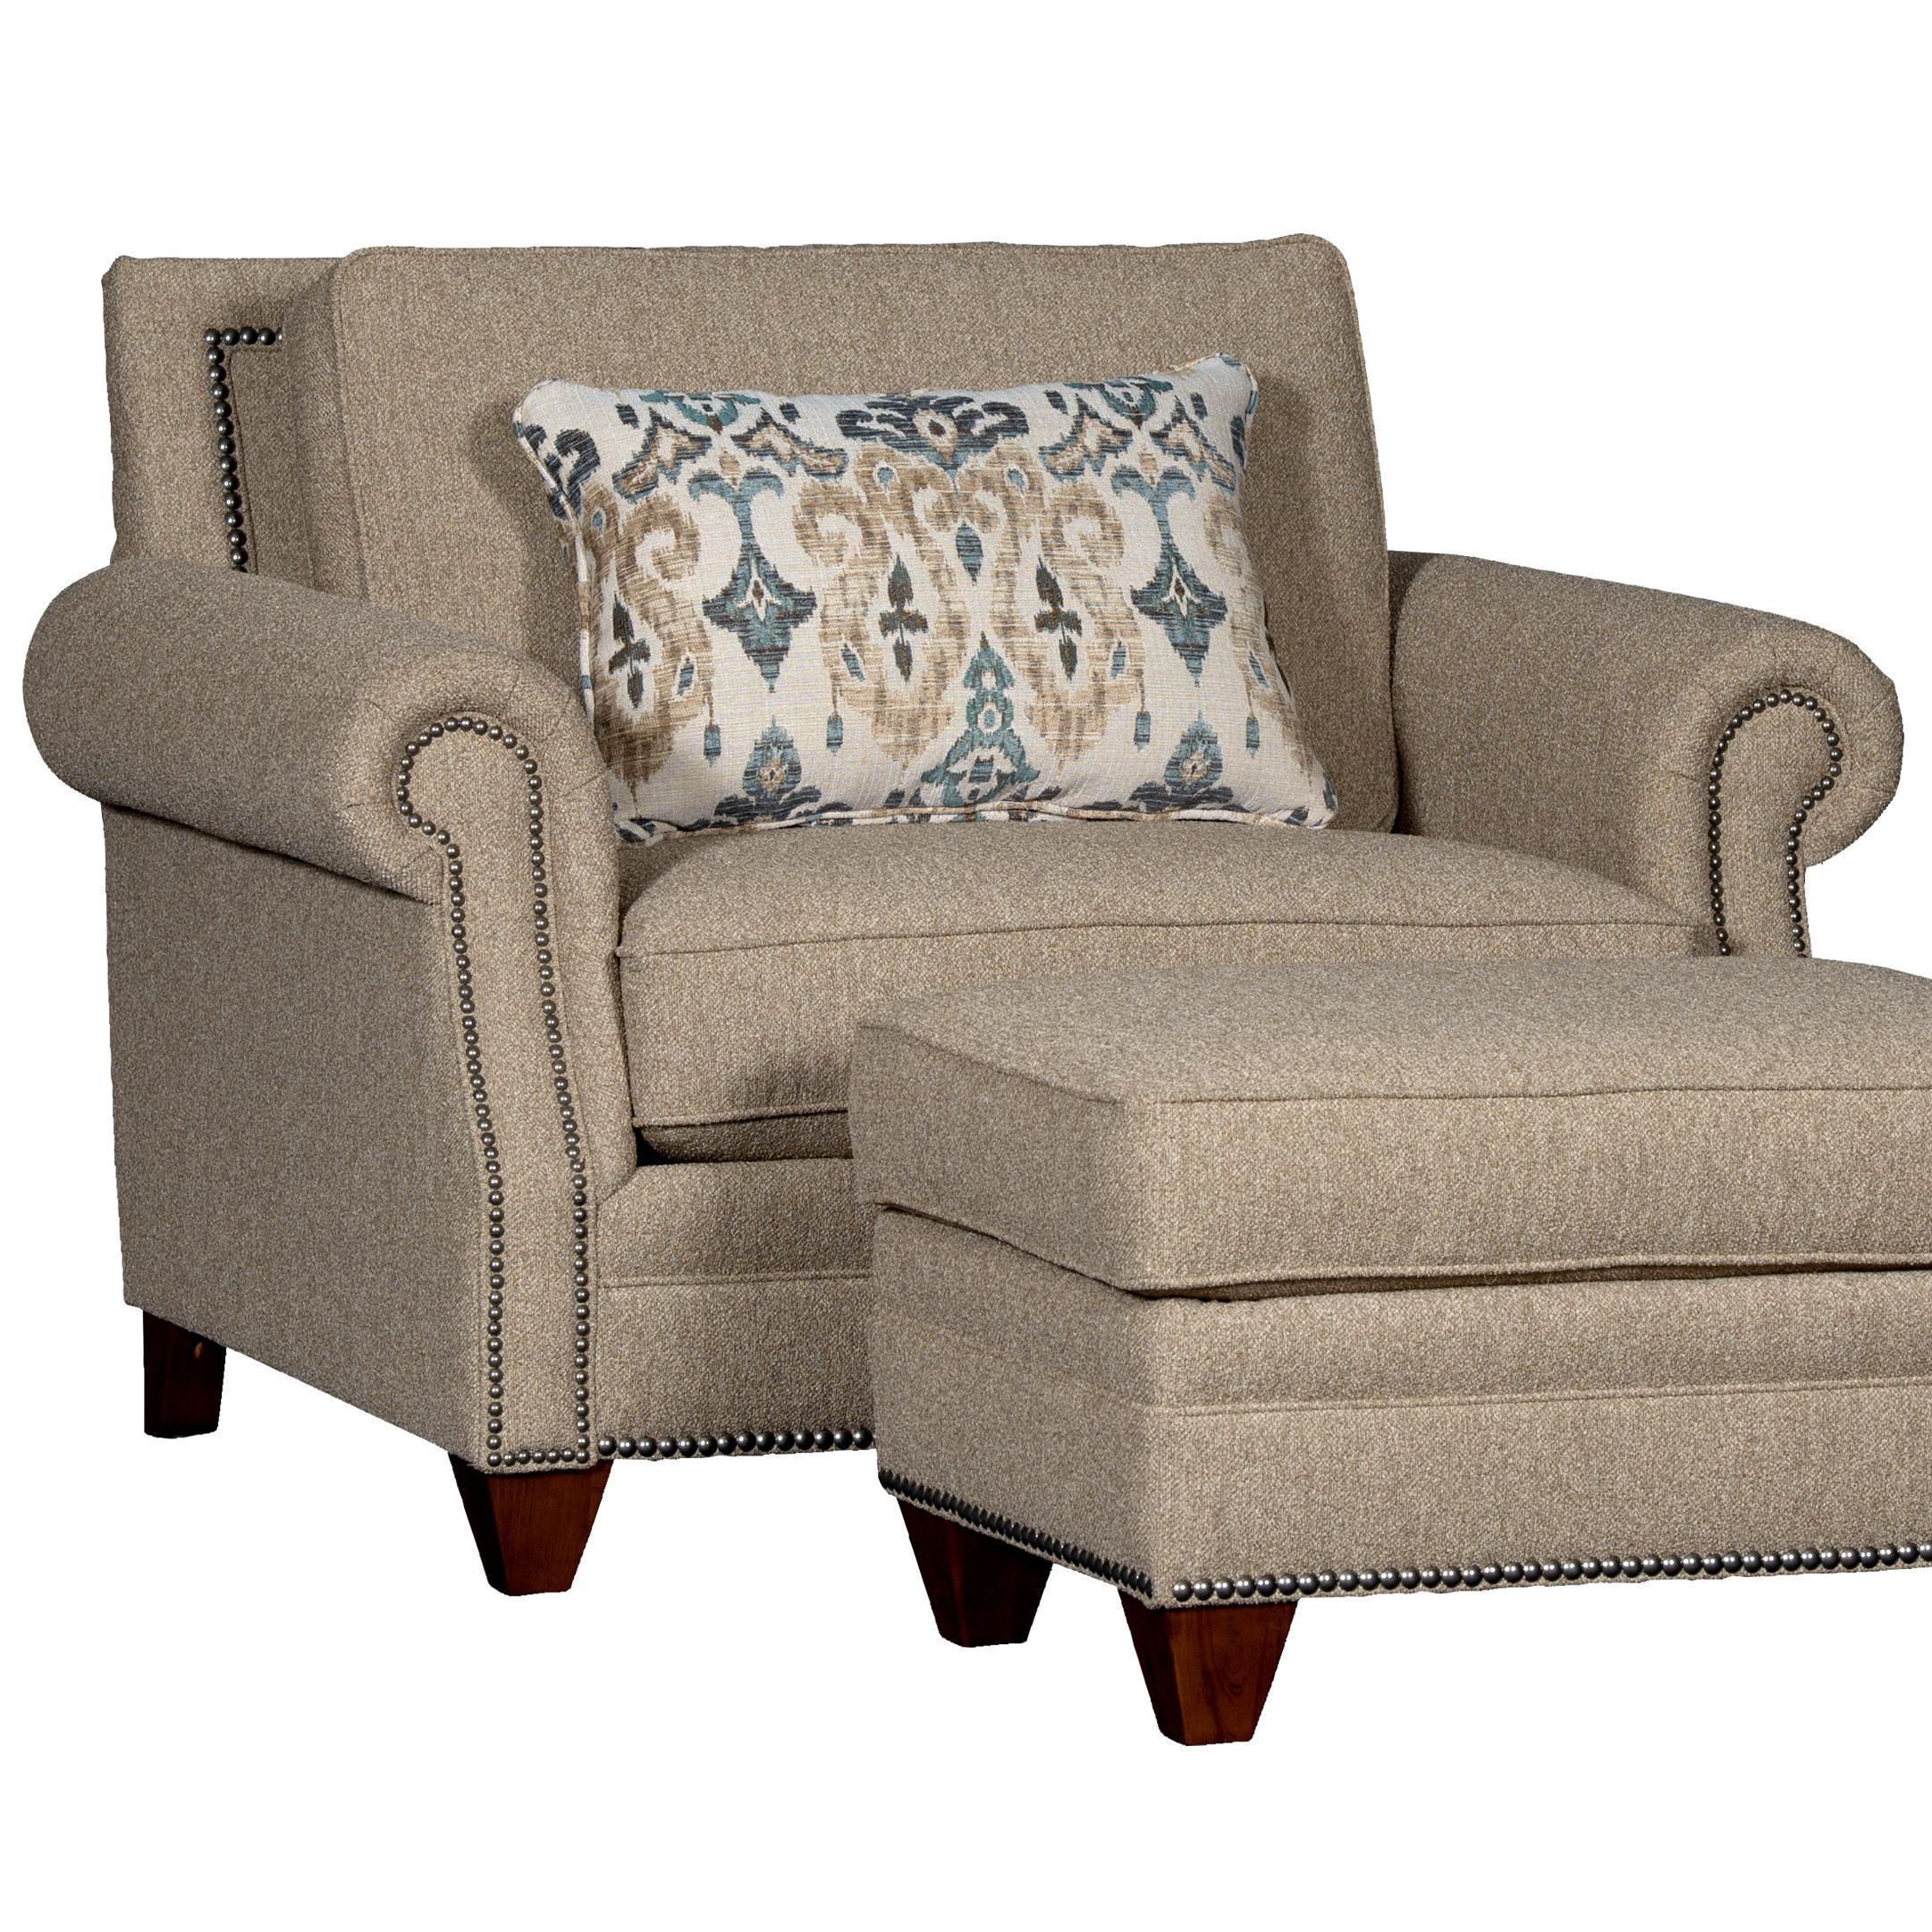 7240 Chair by Mayo at Pedigo Furniture